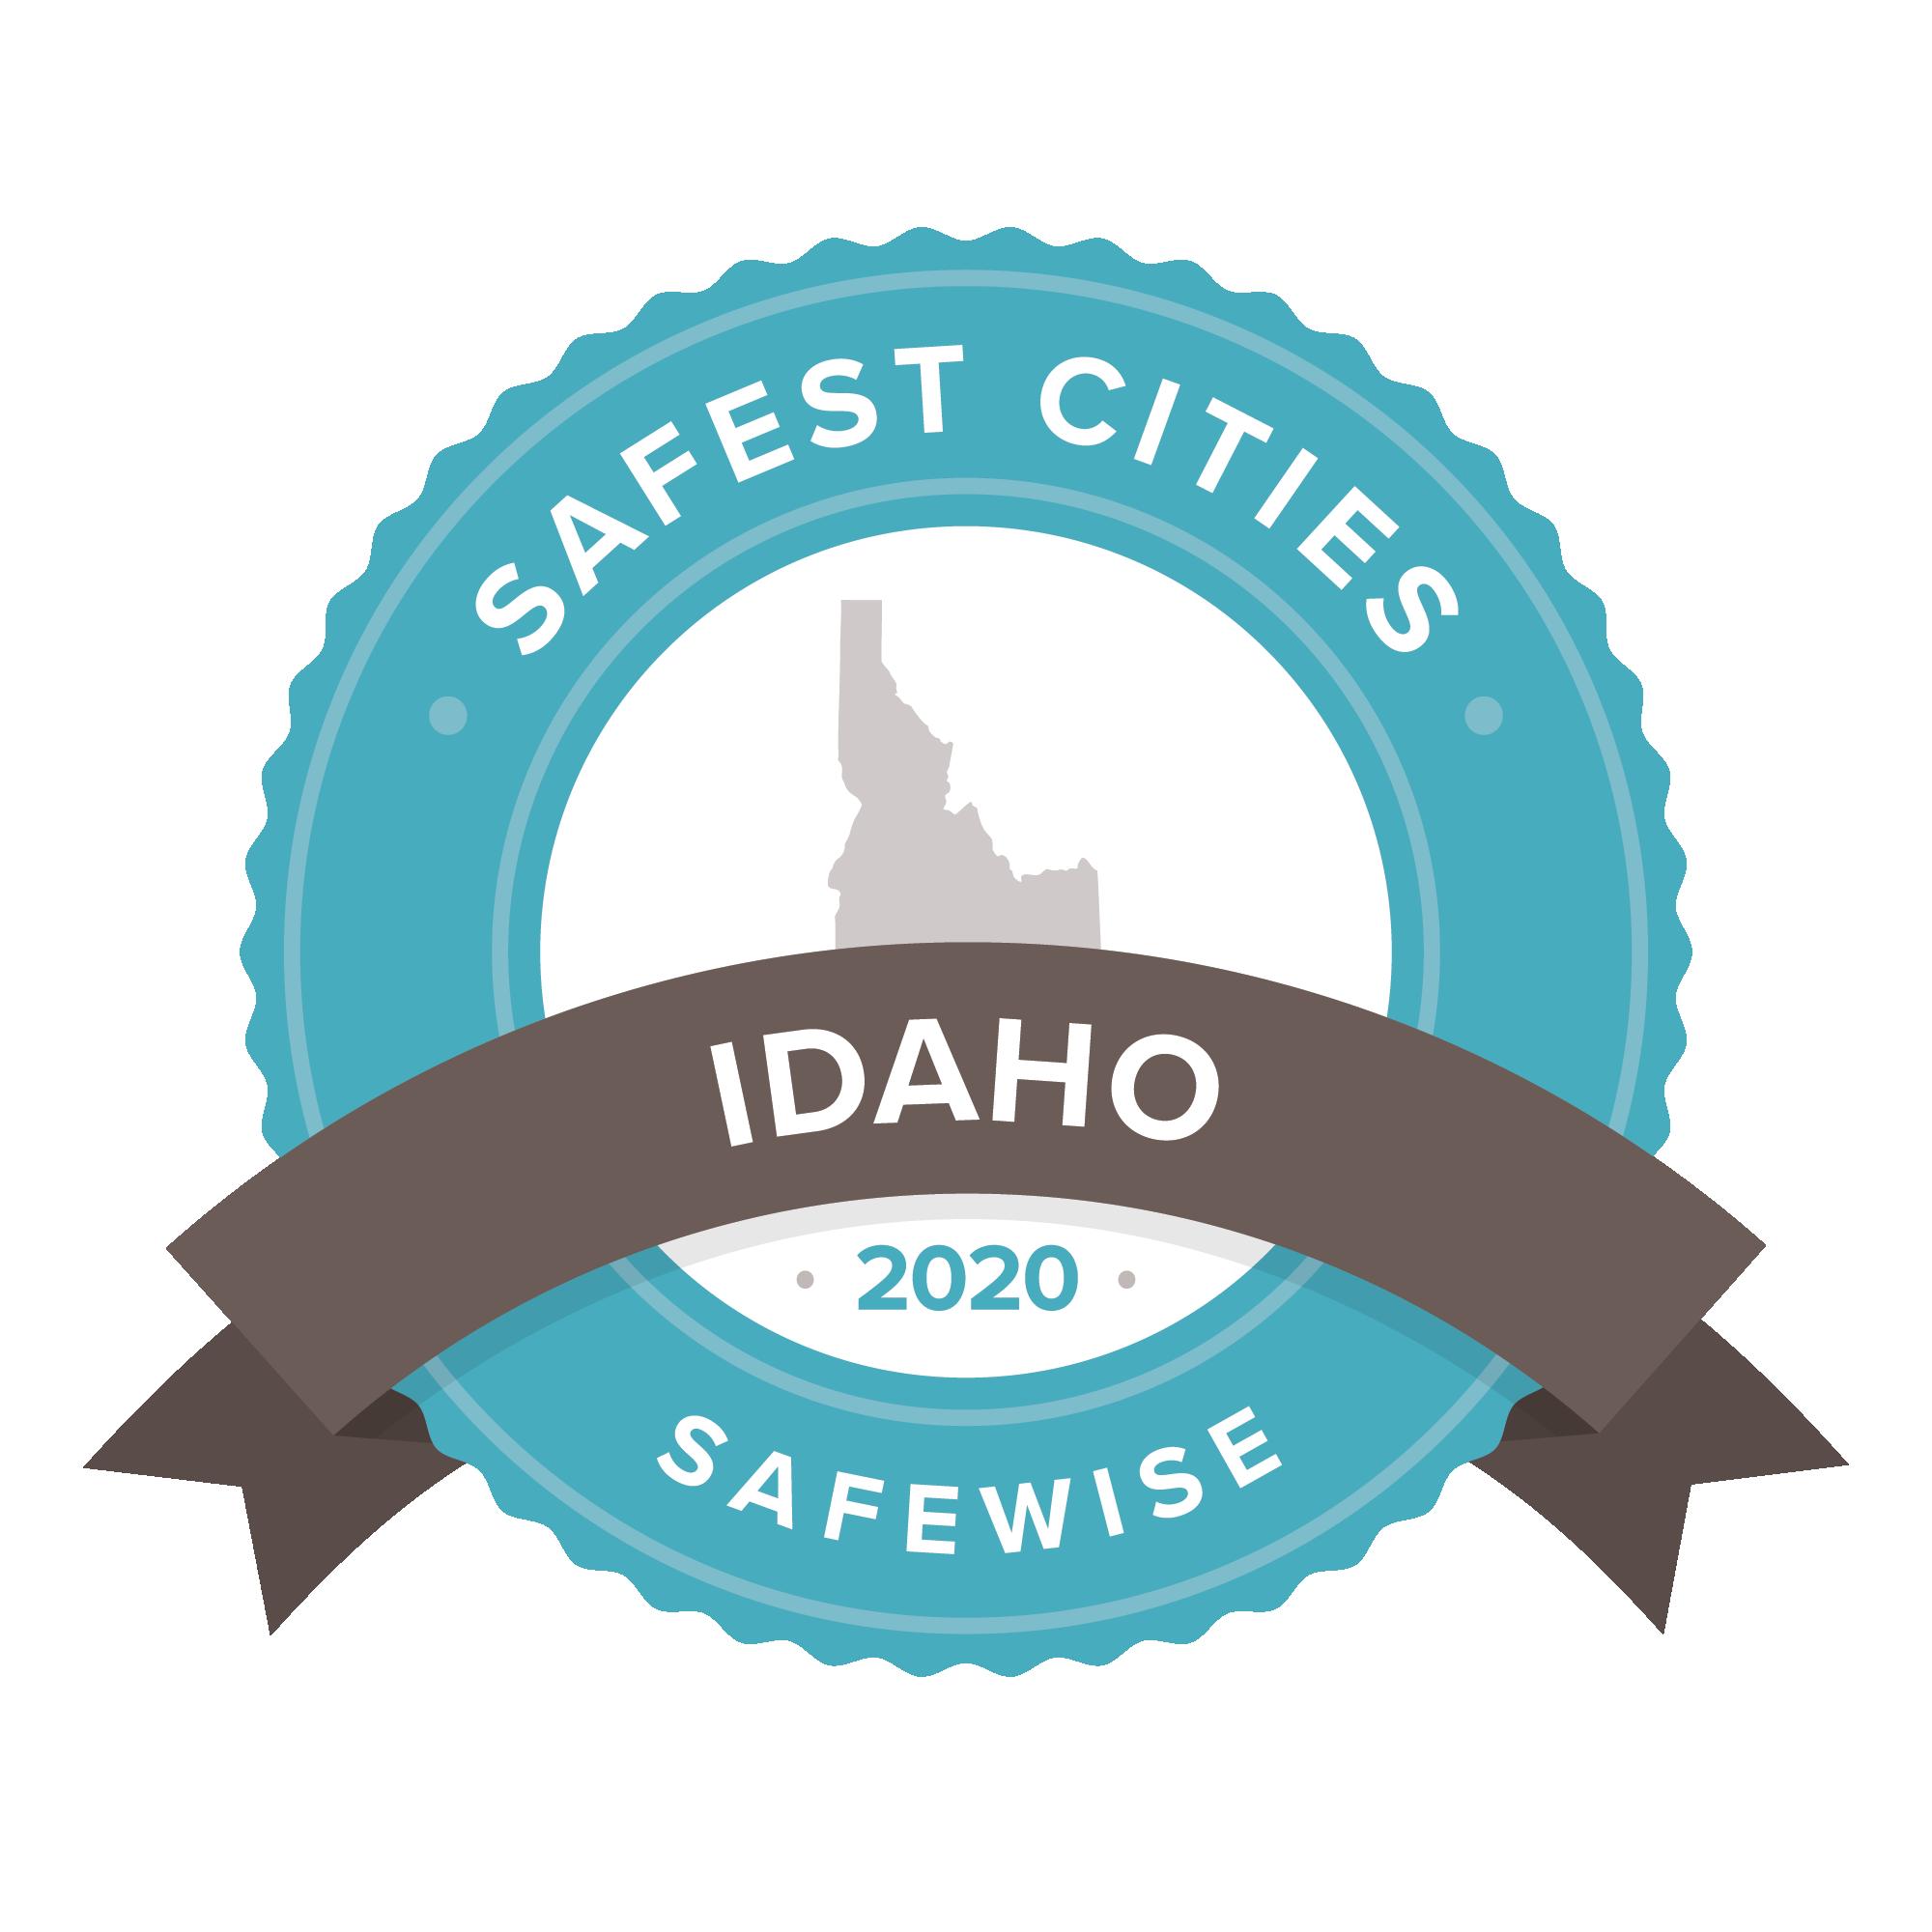 Idaho safest cities badge 2020